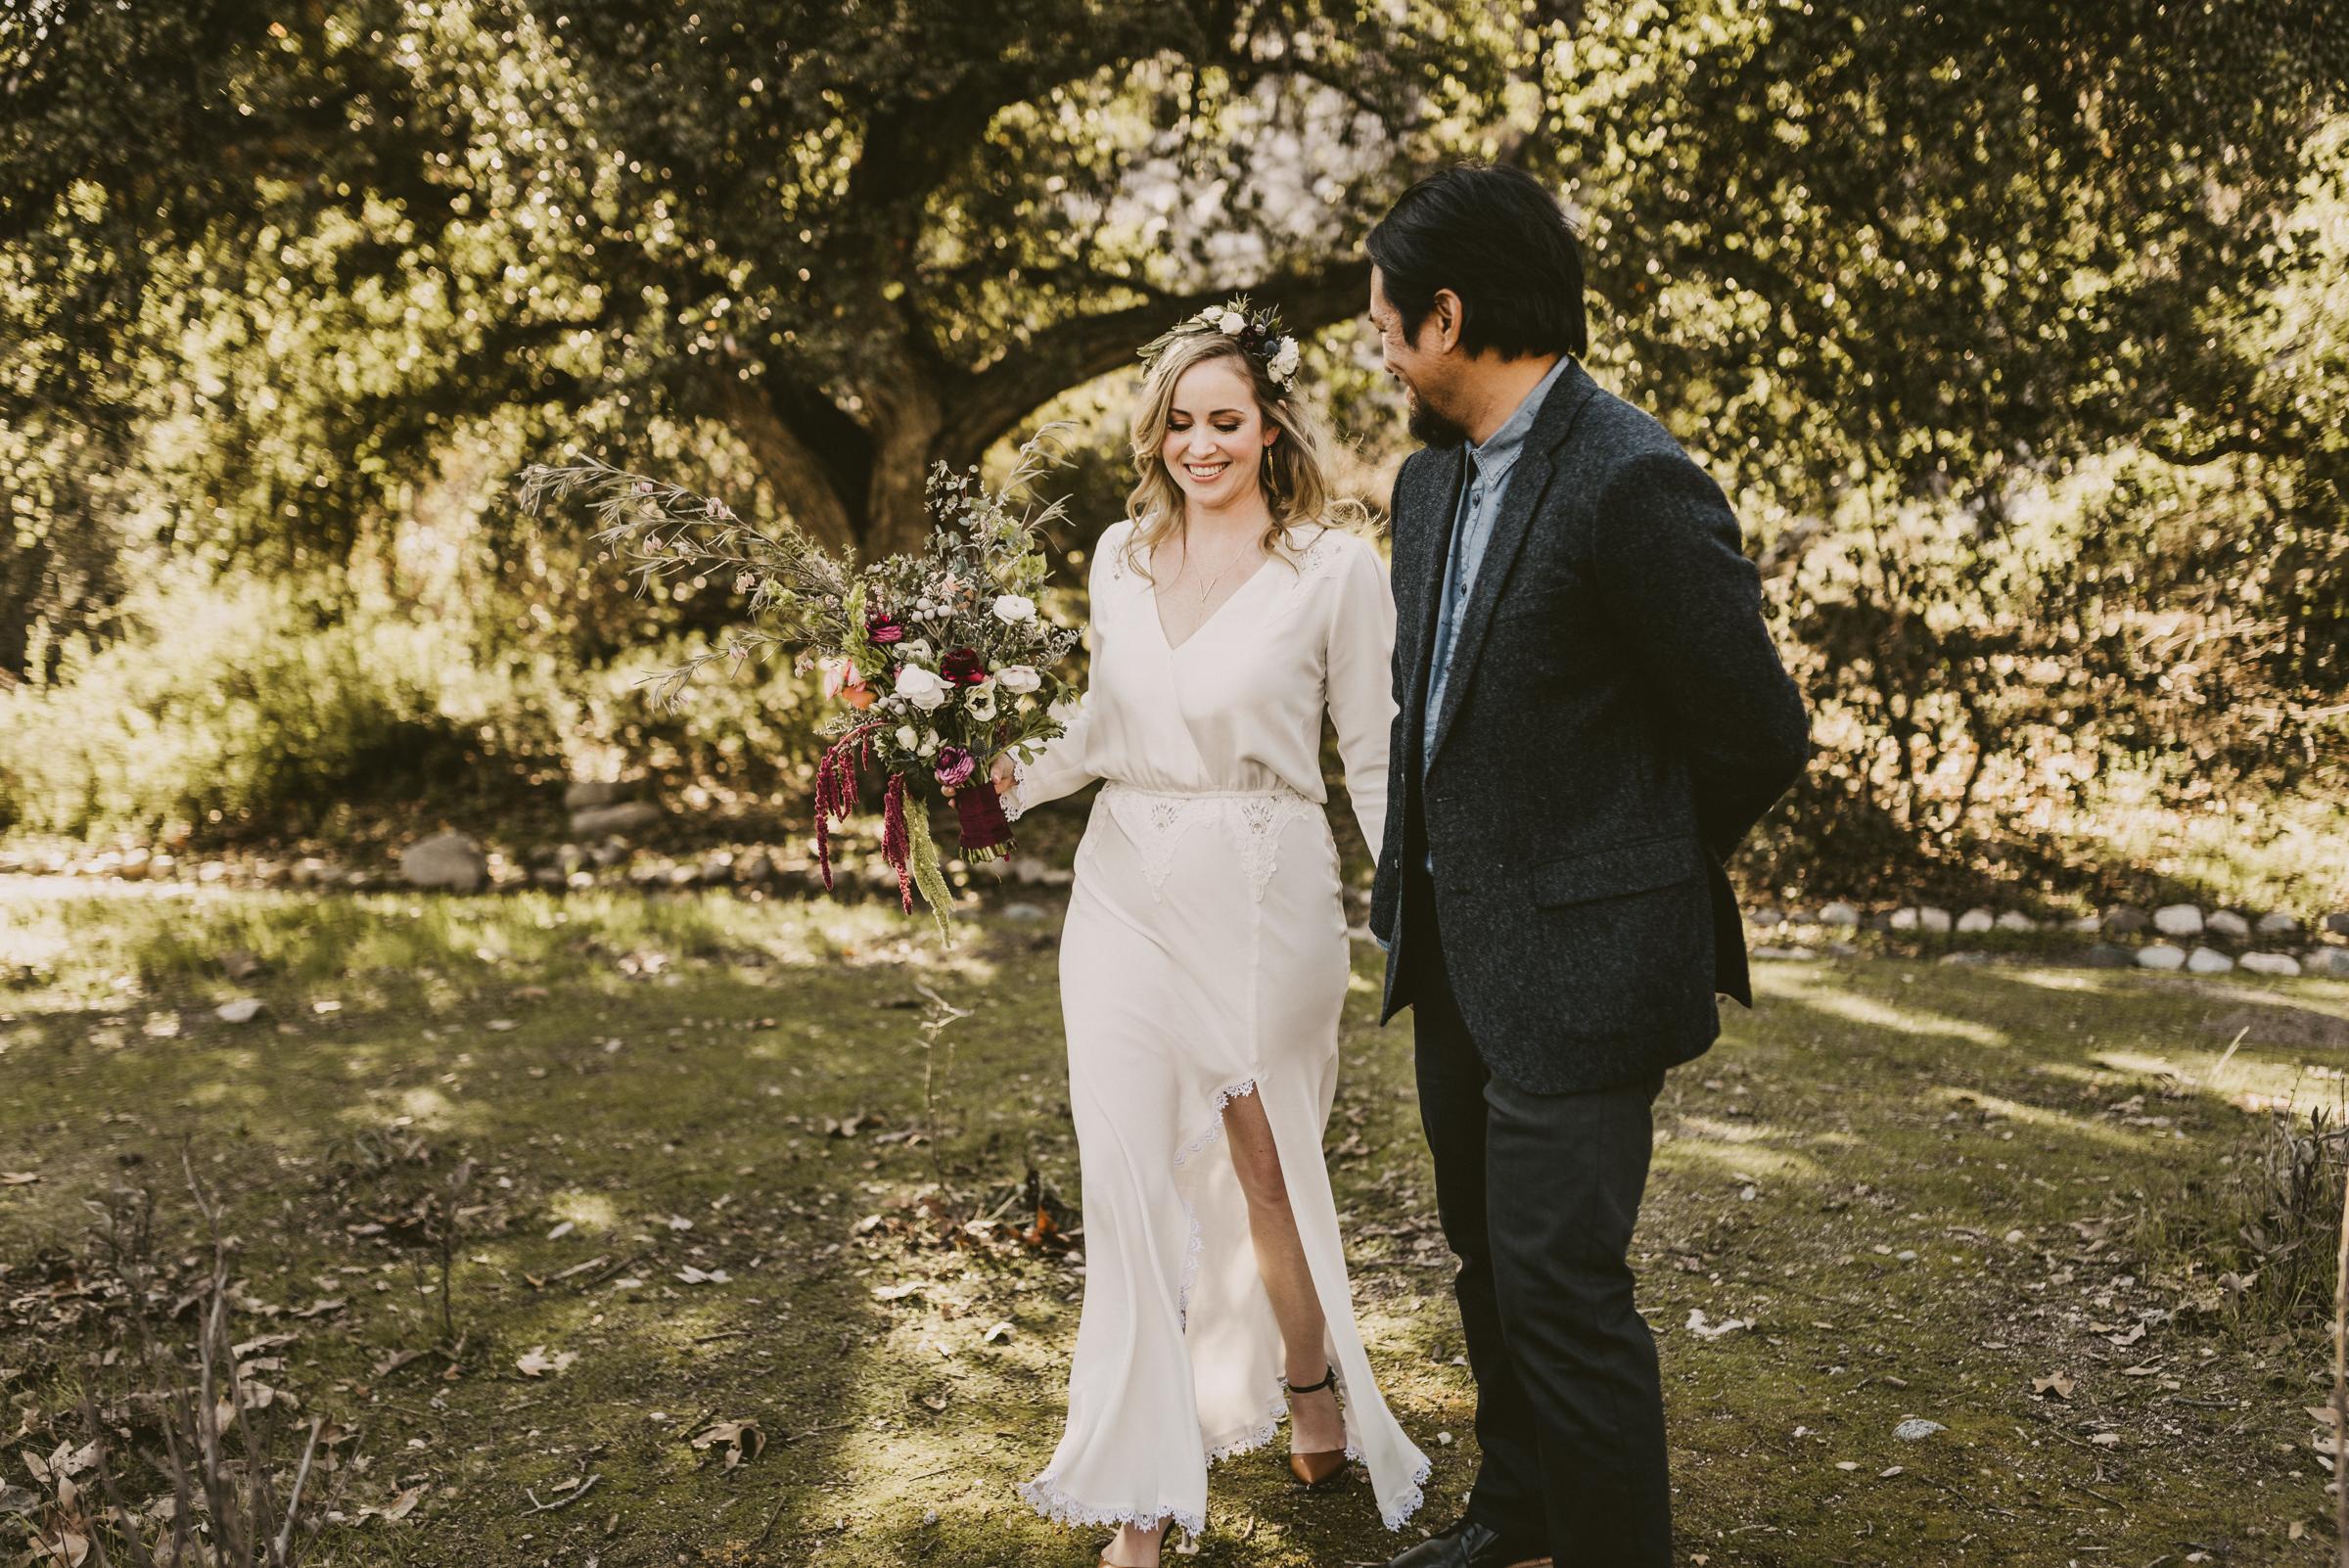 ©Isaiah + Taylor Photography - Intimate Elopement, Eaton Canyon, Los Angeles Wedding Photographer-12.jpg